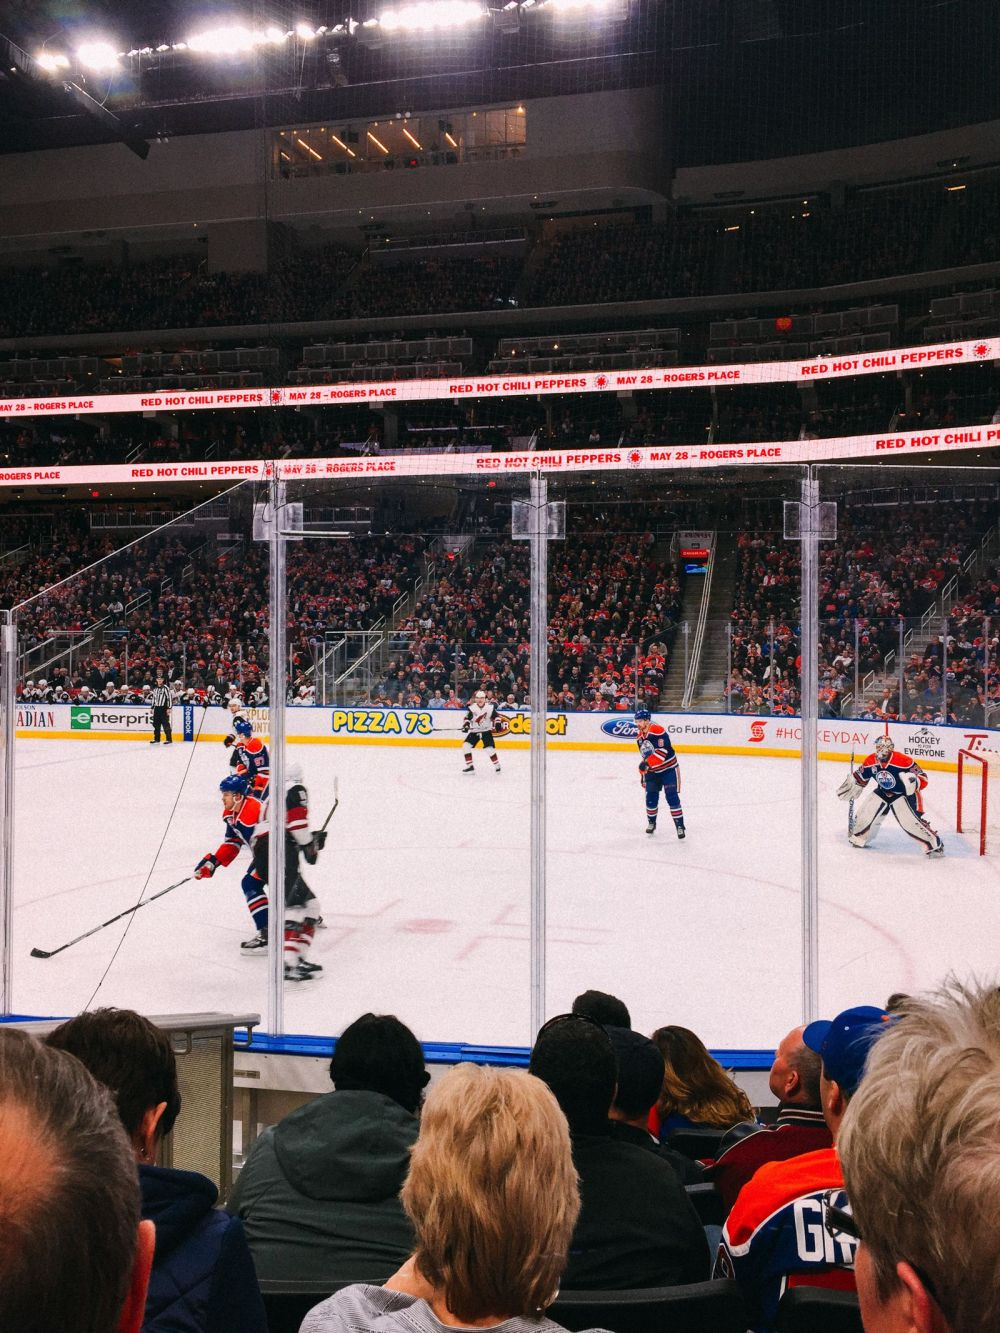 Dog Sledding In Jasper And Ice Hockey In Edmonton - 2 Canadian 'Must-Do's! (70)